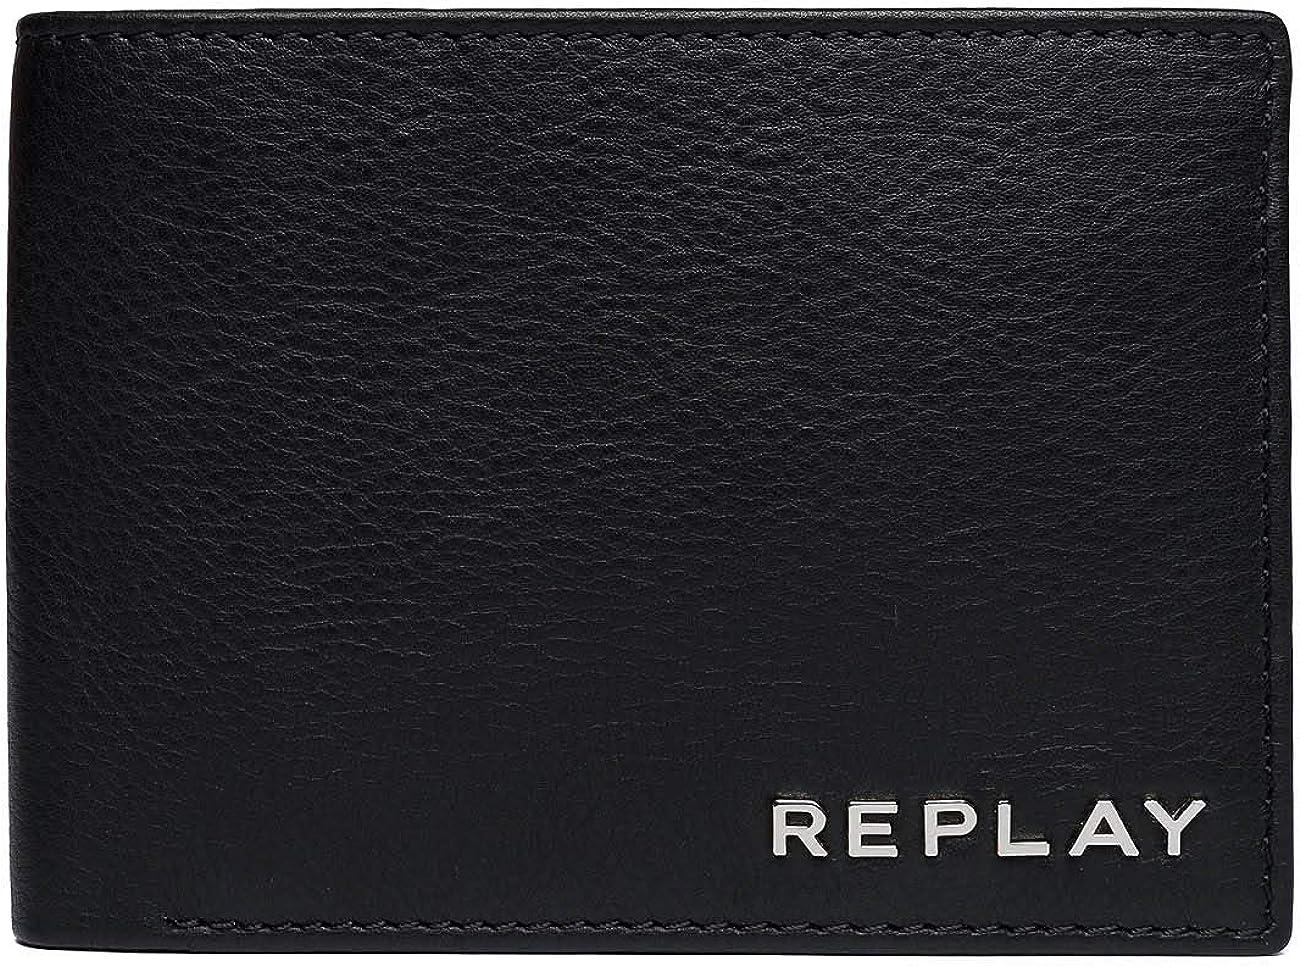 REPLAY Billetera De Cuero Bi-fold Premium, Negro